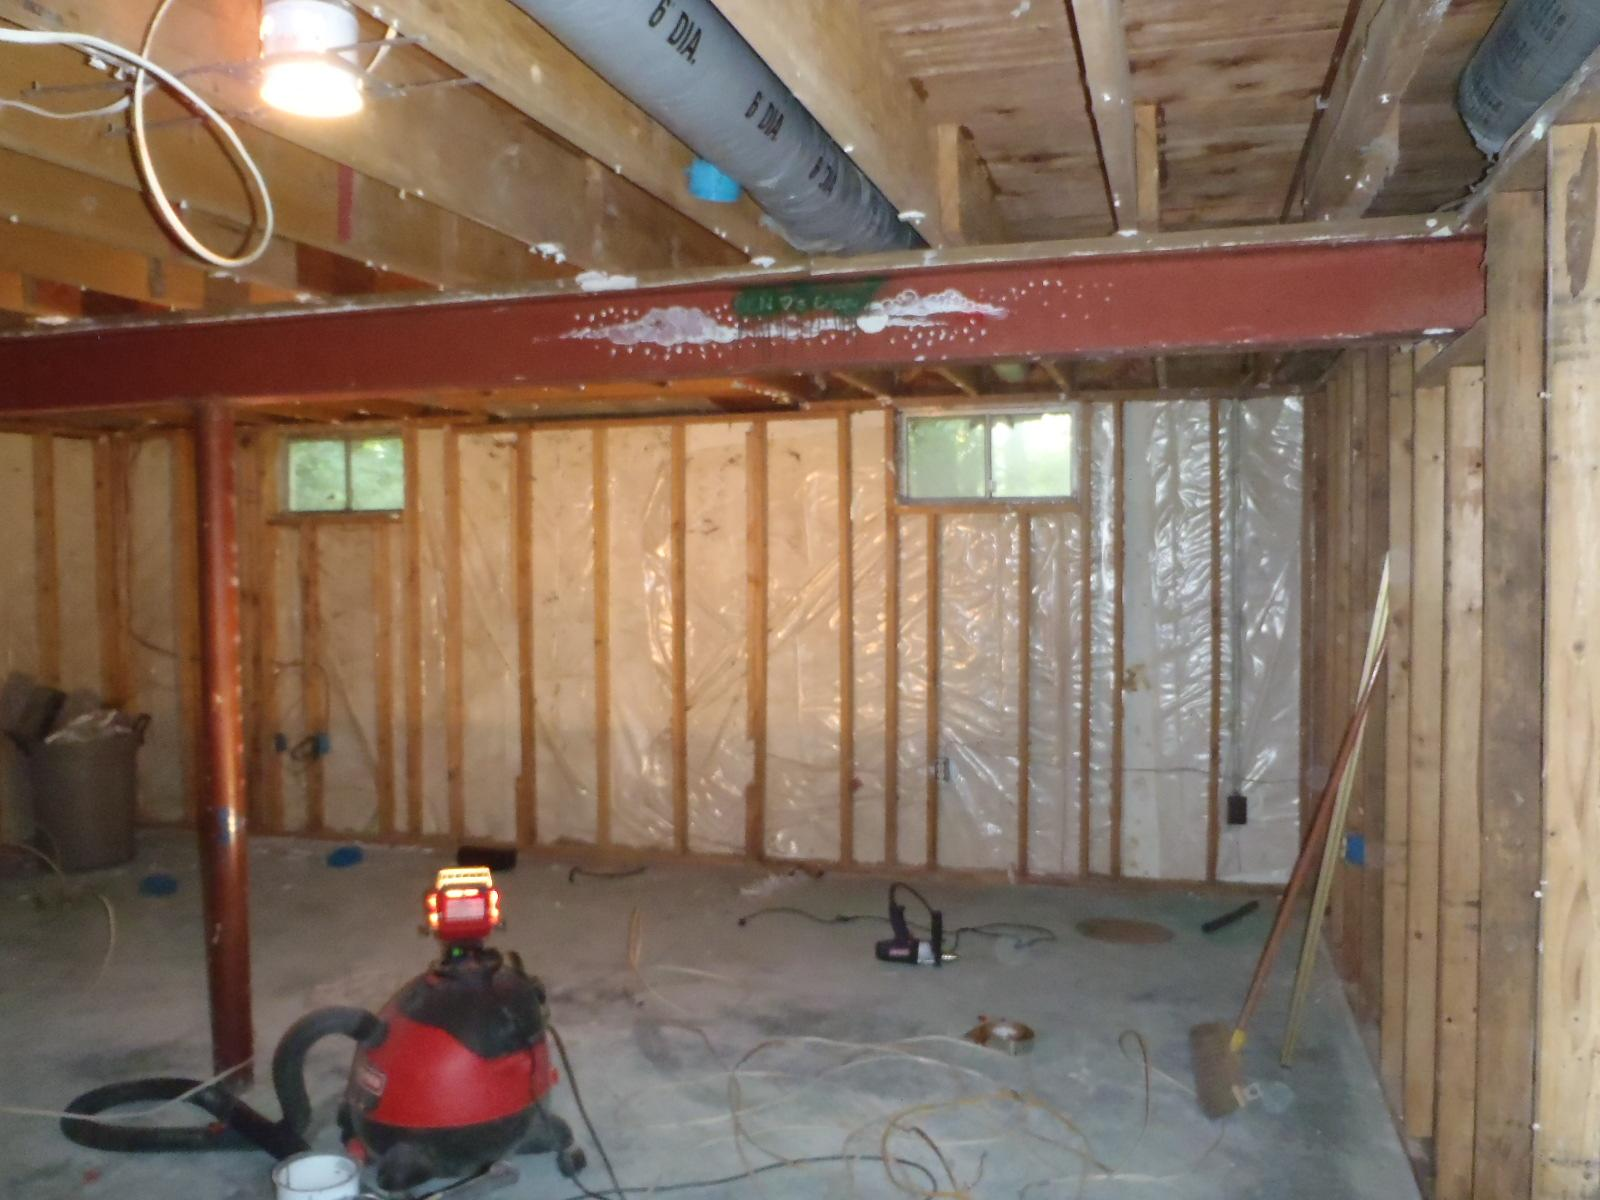 Spray Foam Insulation Installation in a Newark, DE Basement - Before Photo